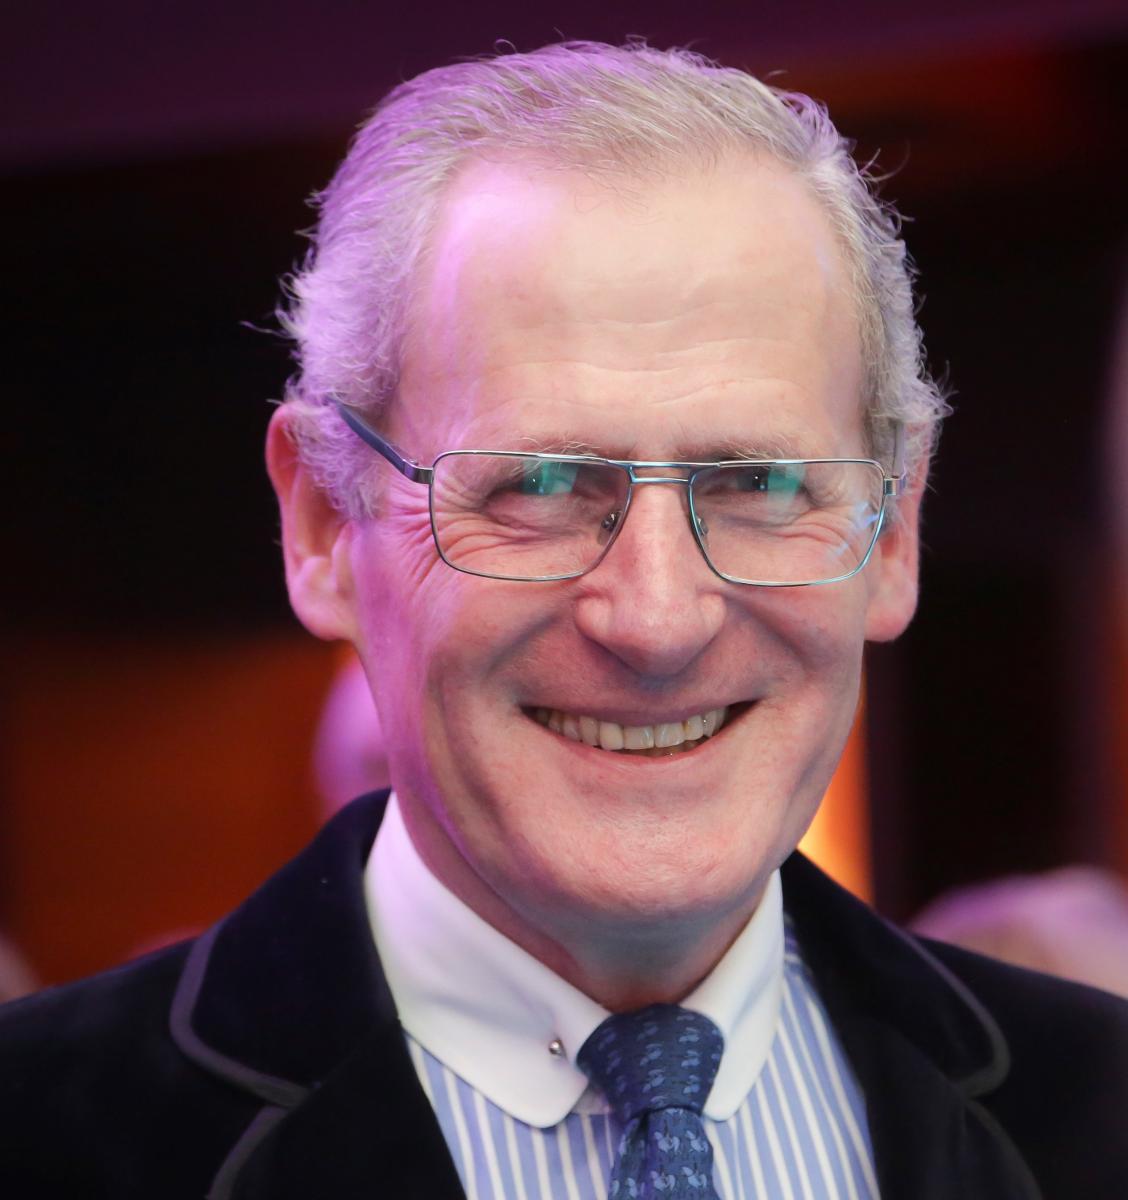 FEI Jumping directeur John Roche met pensioen